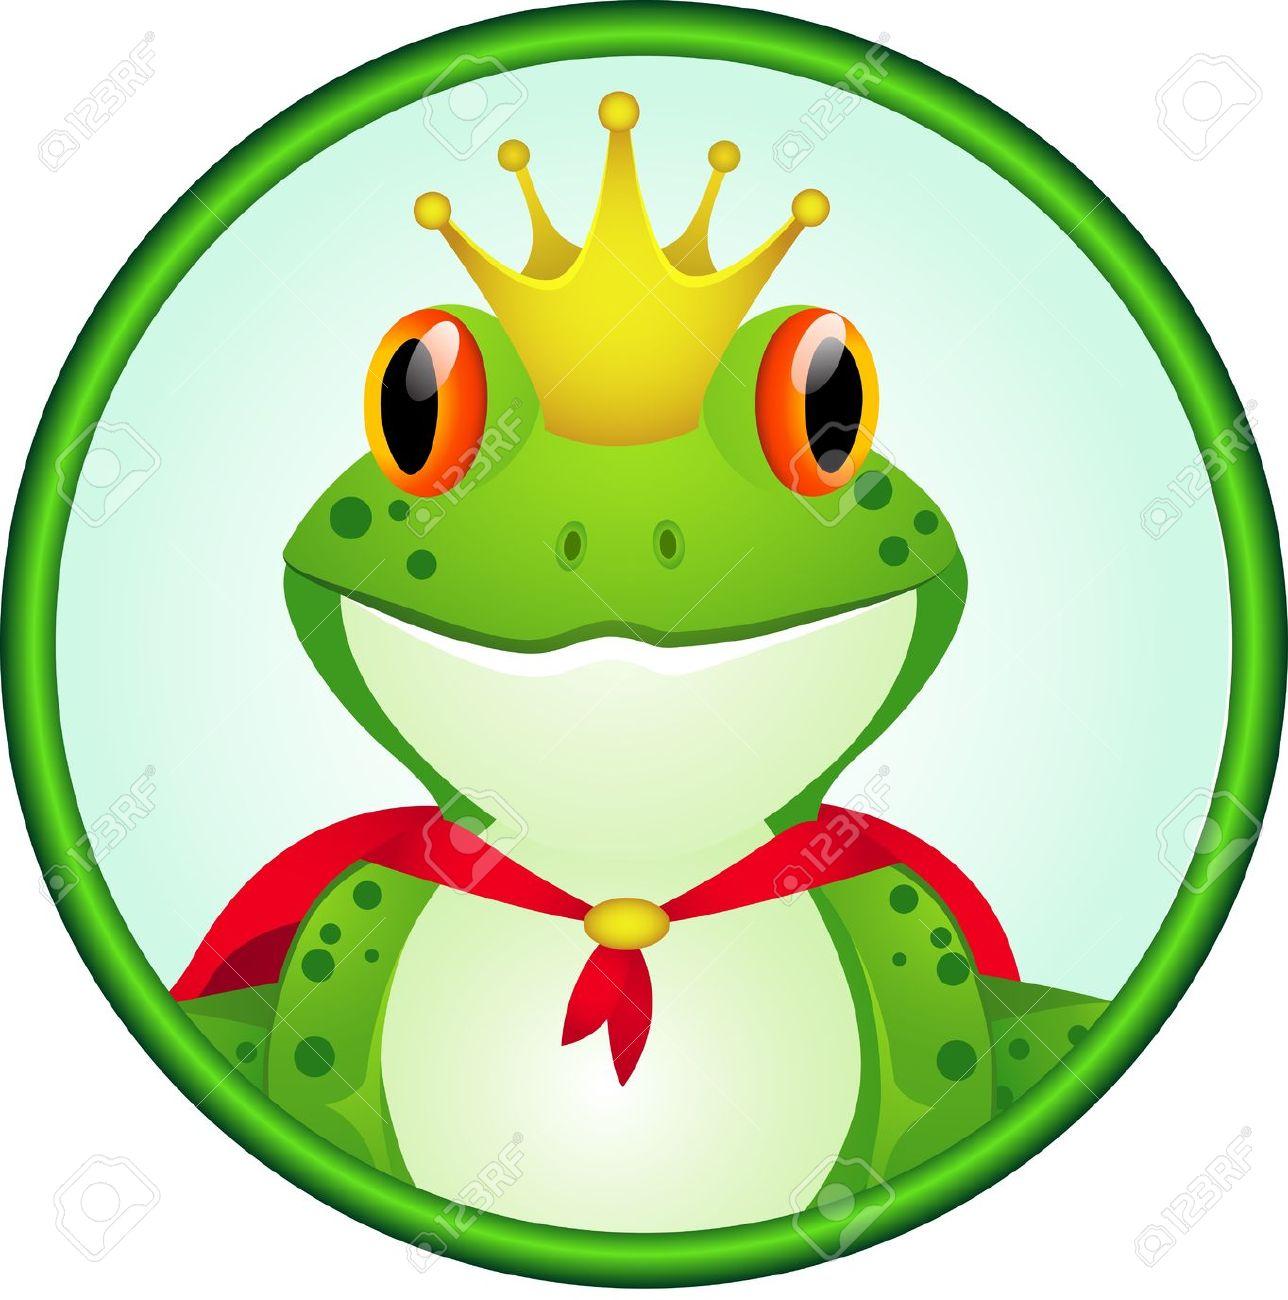 King Of Frog Cartoon Royalty Free Cliparts, Vectors, And Stock.